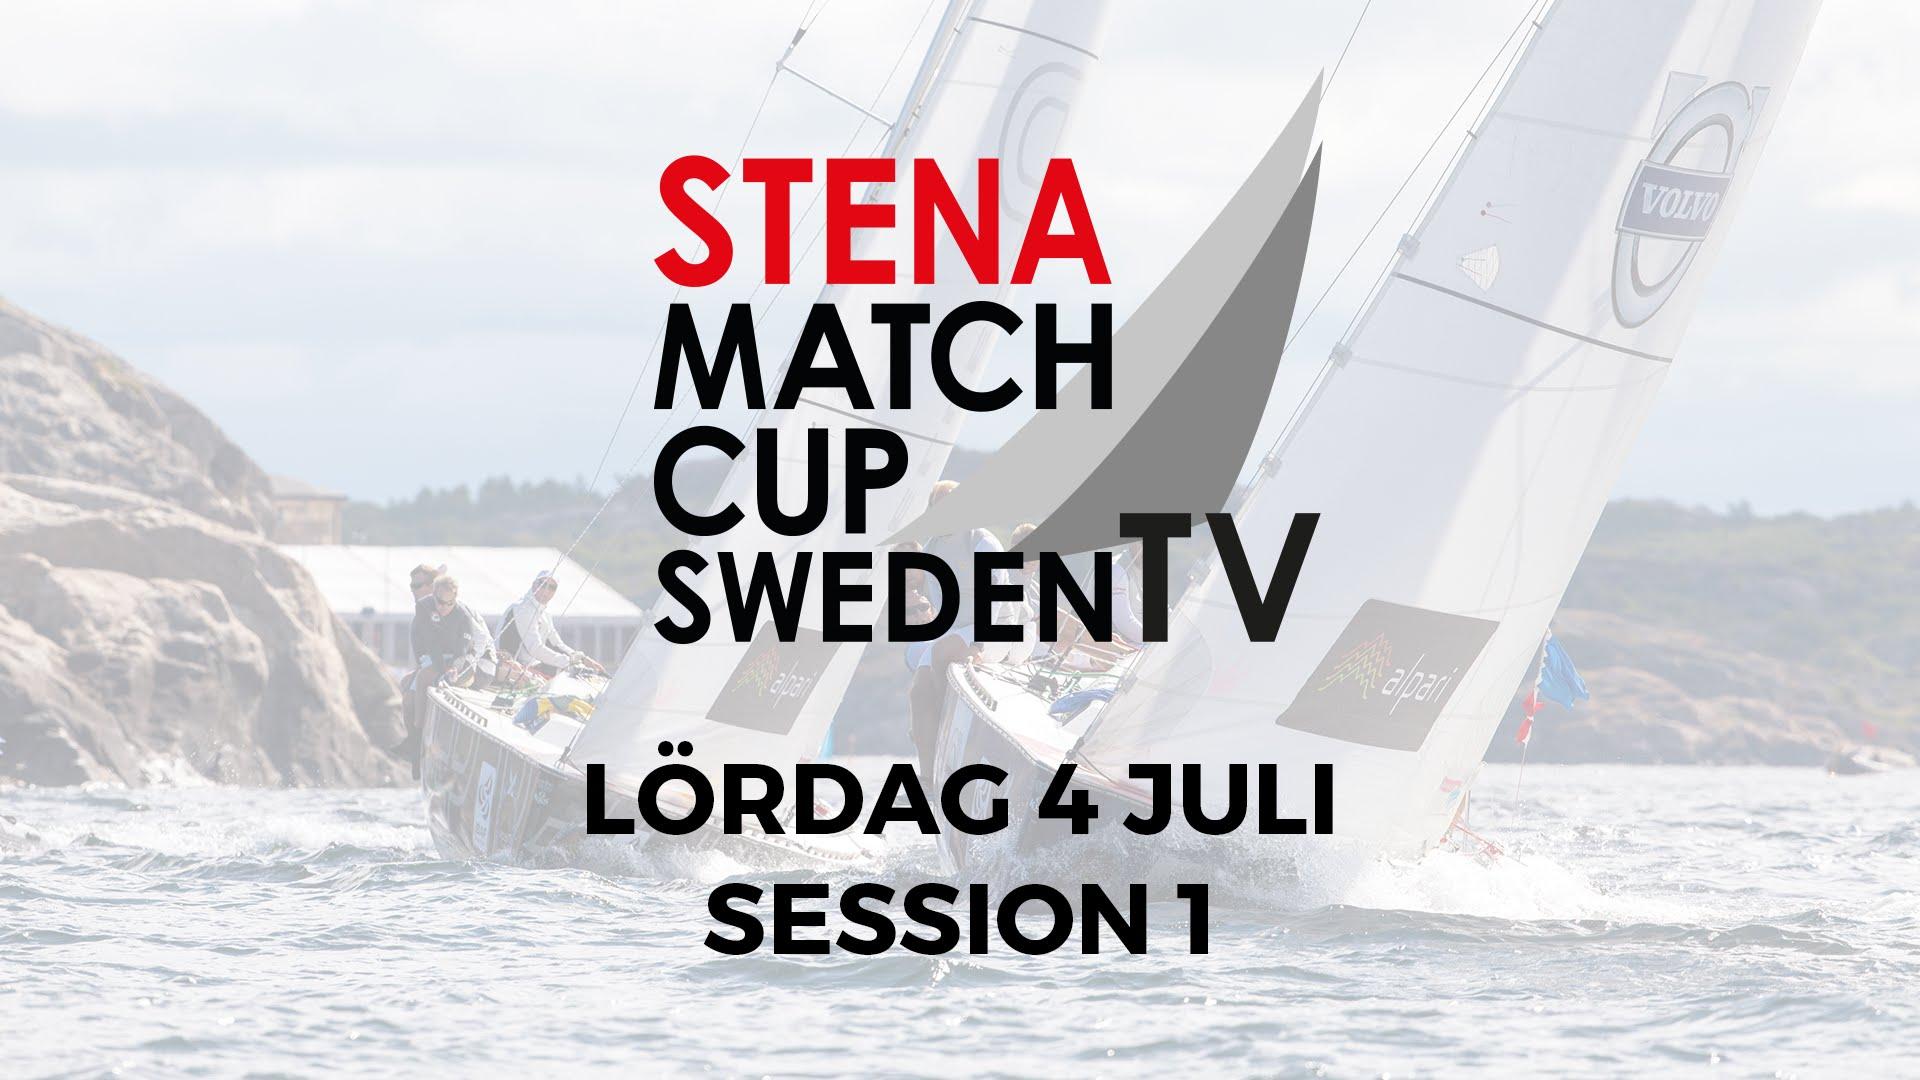 Stena Match Cup Sweden | live